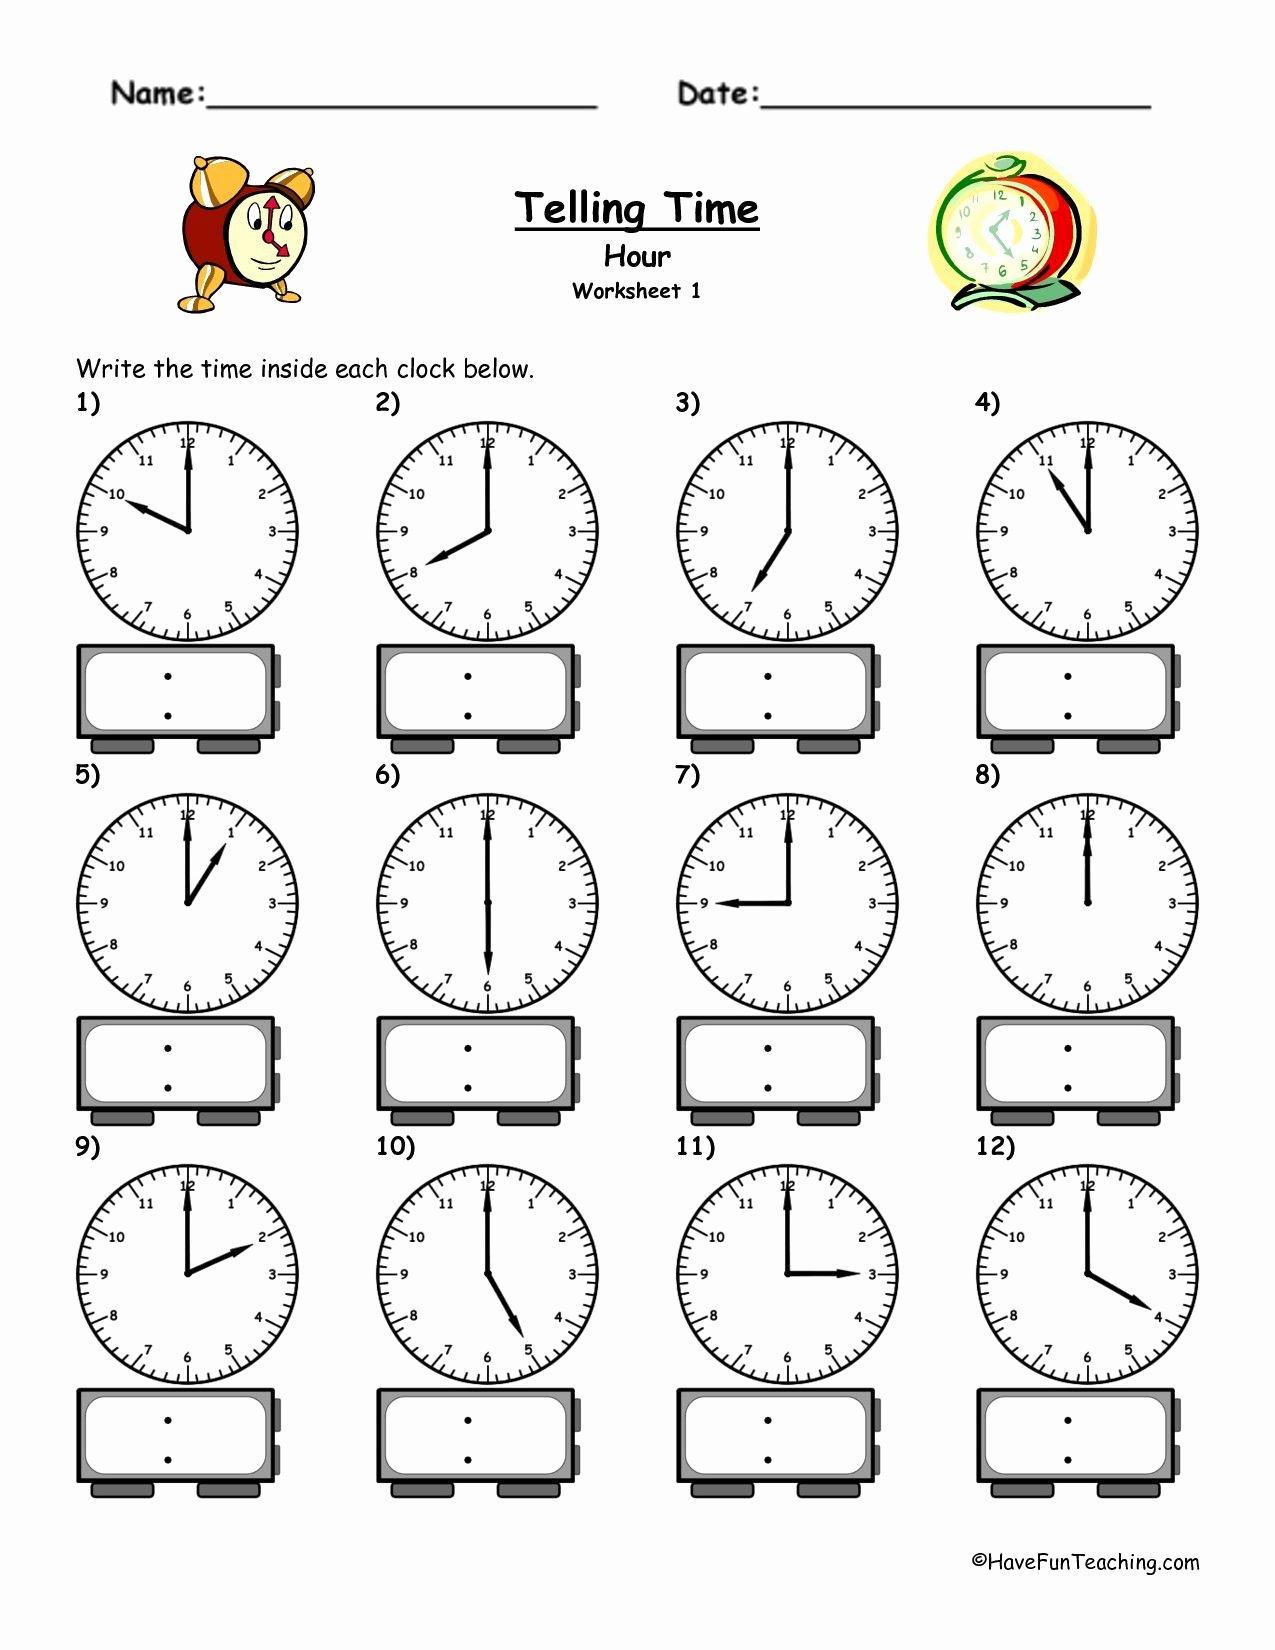 Time Worksheets for Preschoolers Beautiful Image Result for Time Worksheet Preschool